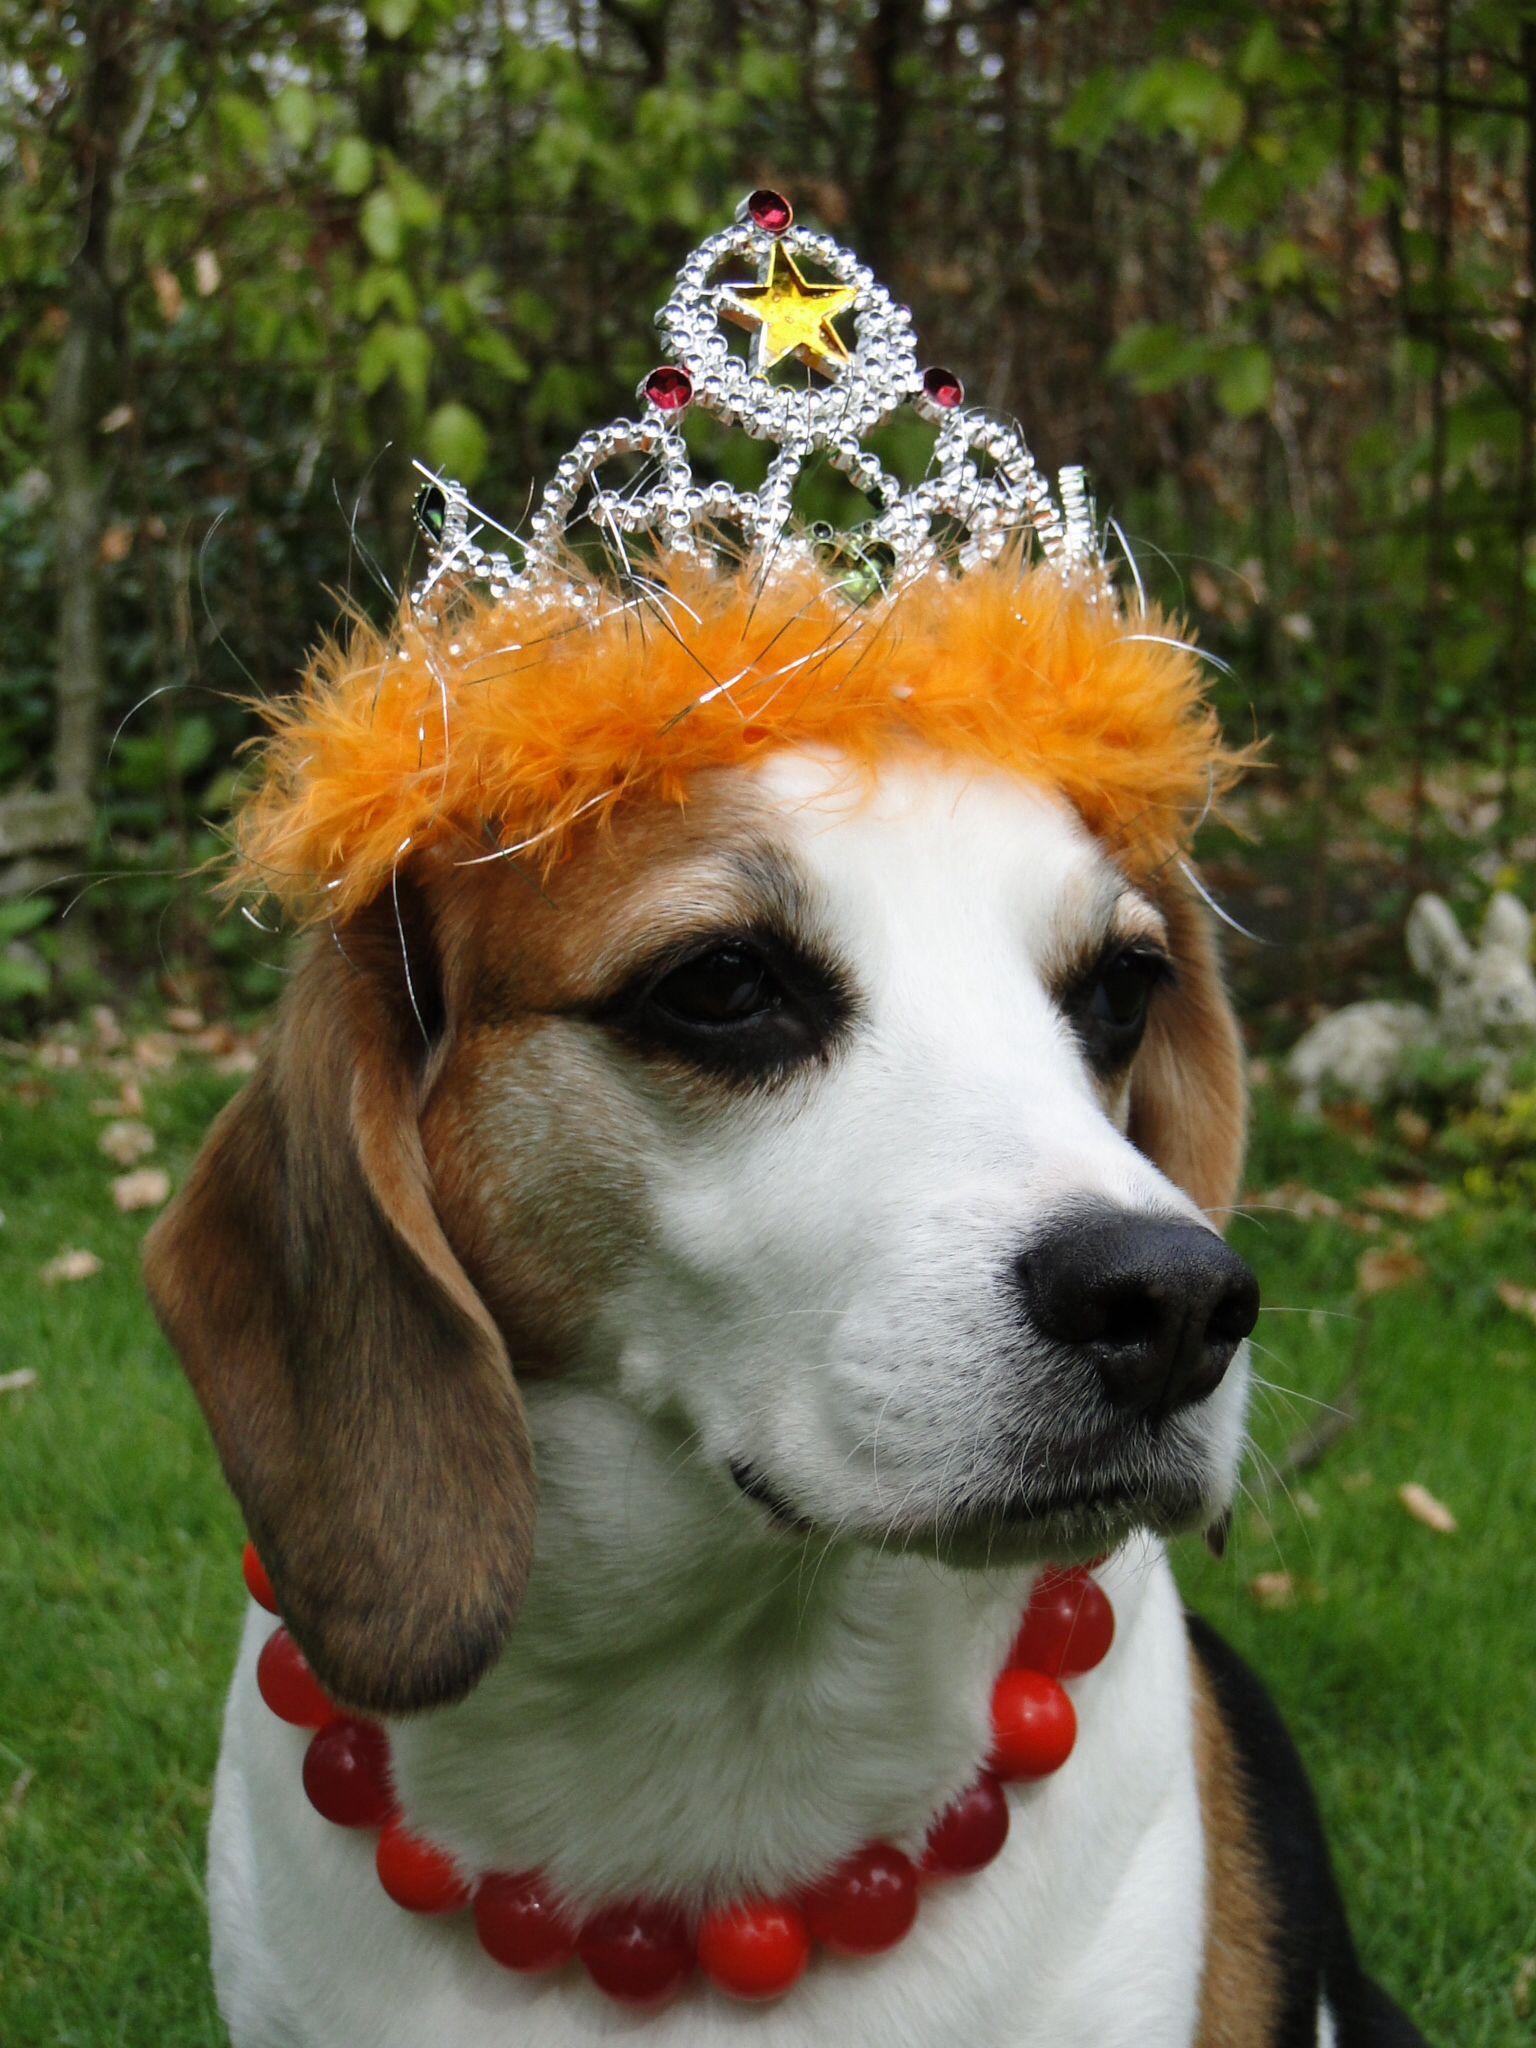 Queen Bibi The Beagle